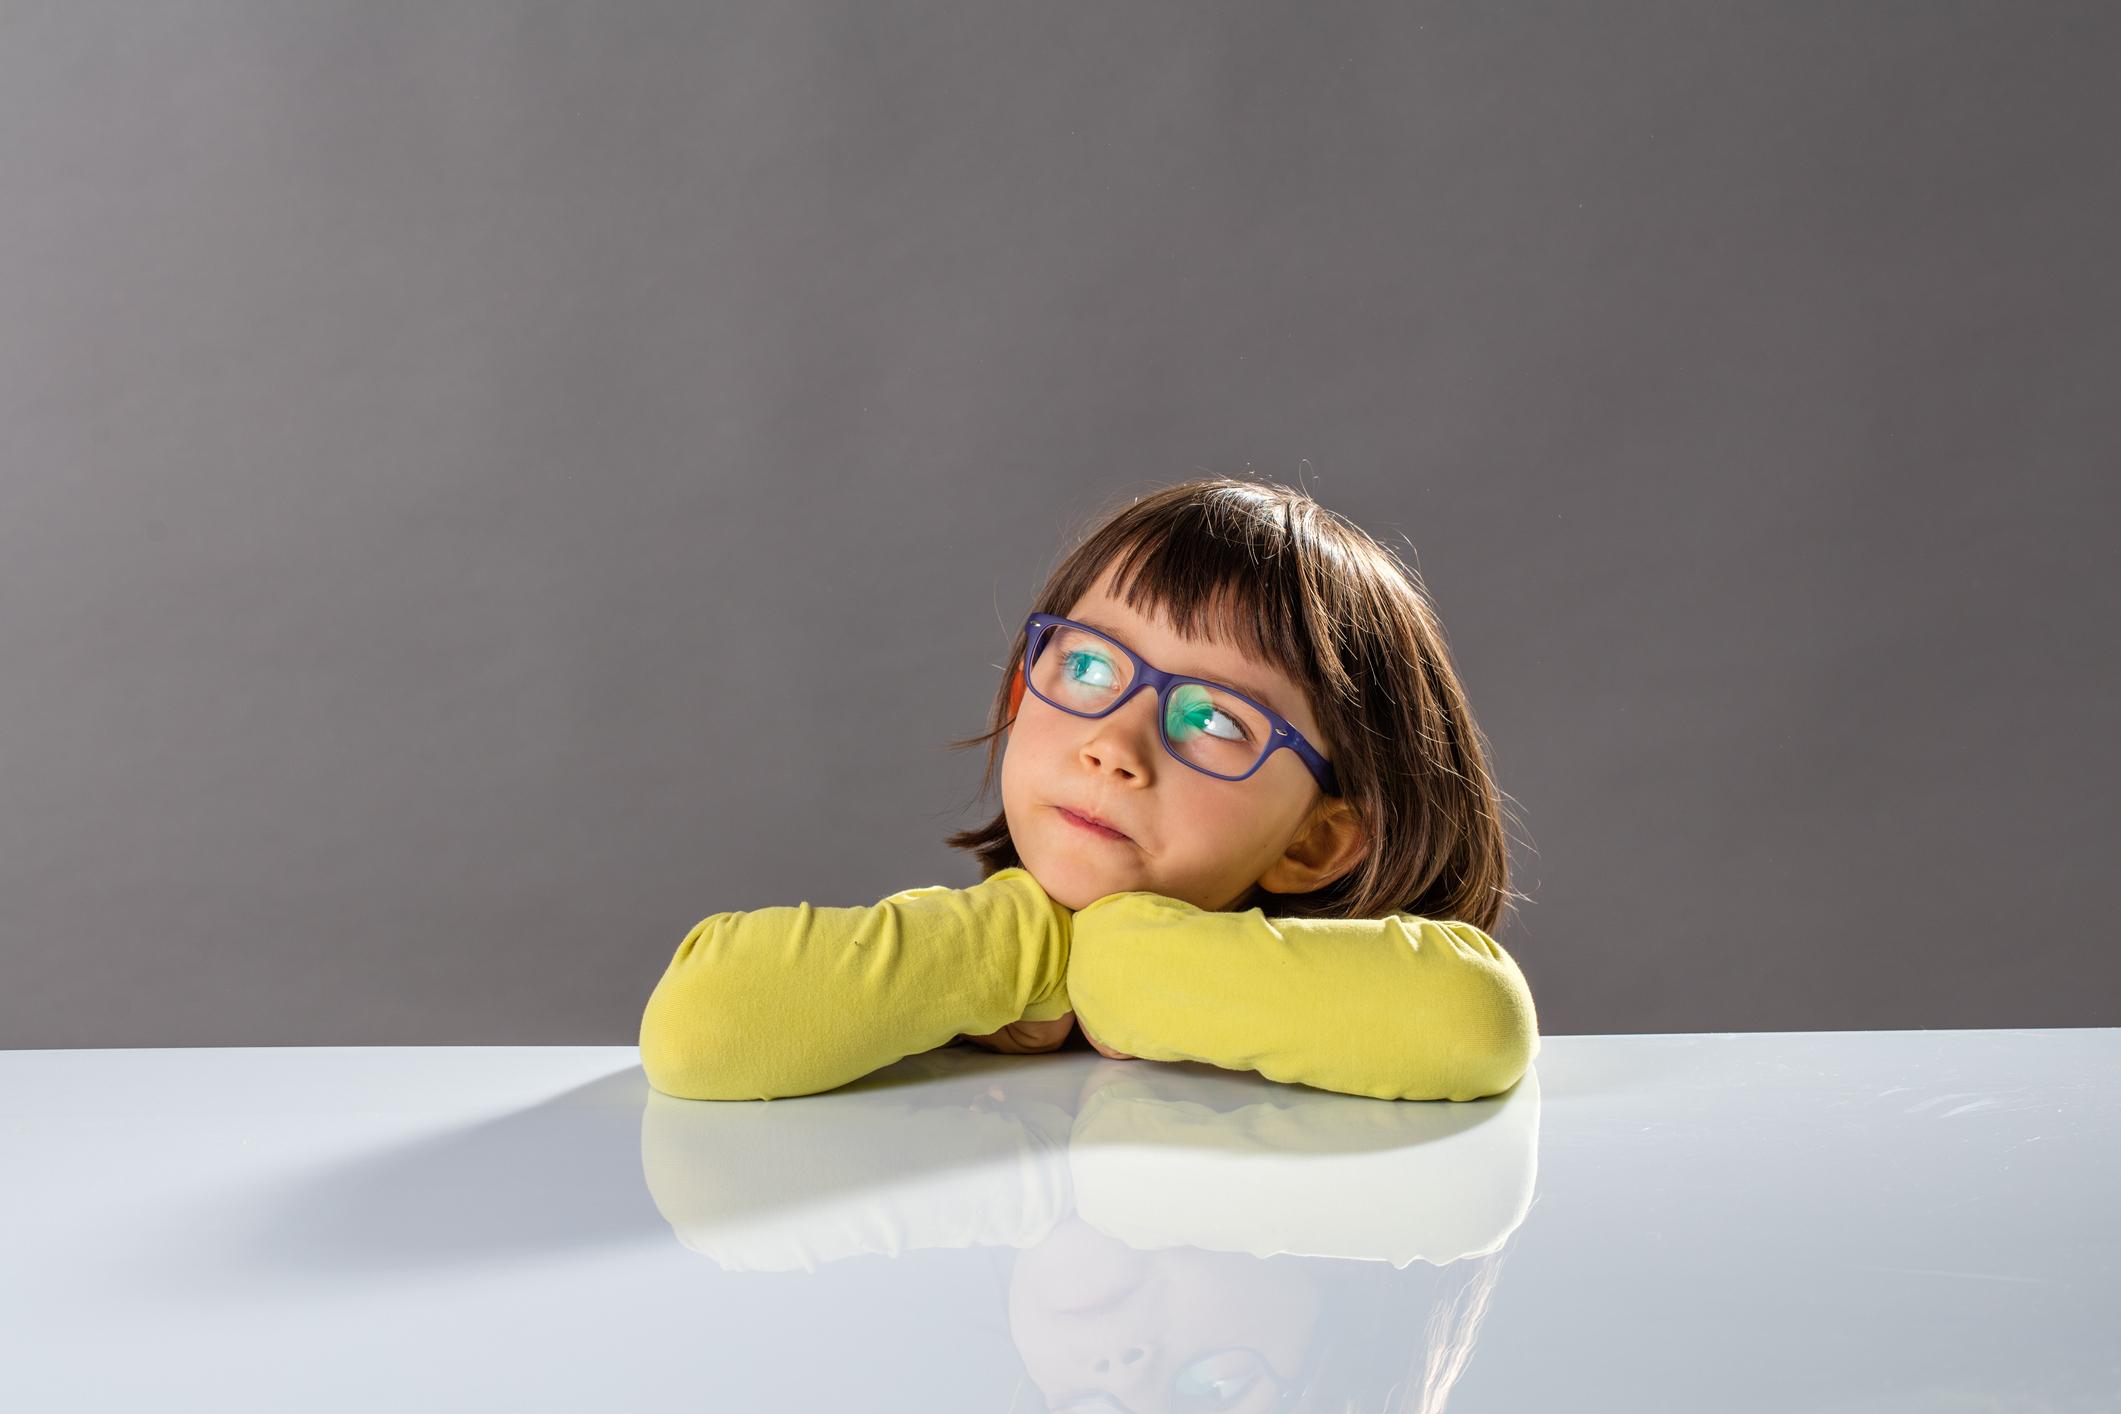 girl kid child alexa siri google home amazon skeptical cynical don't believe